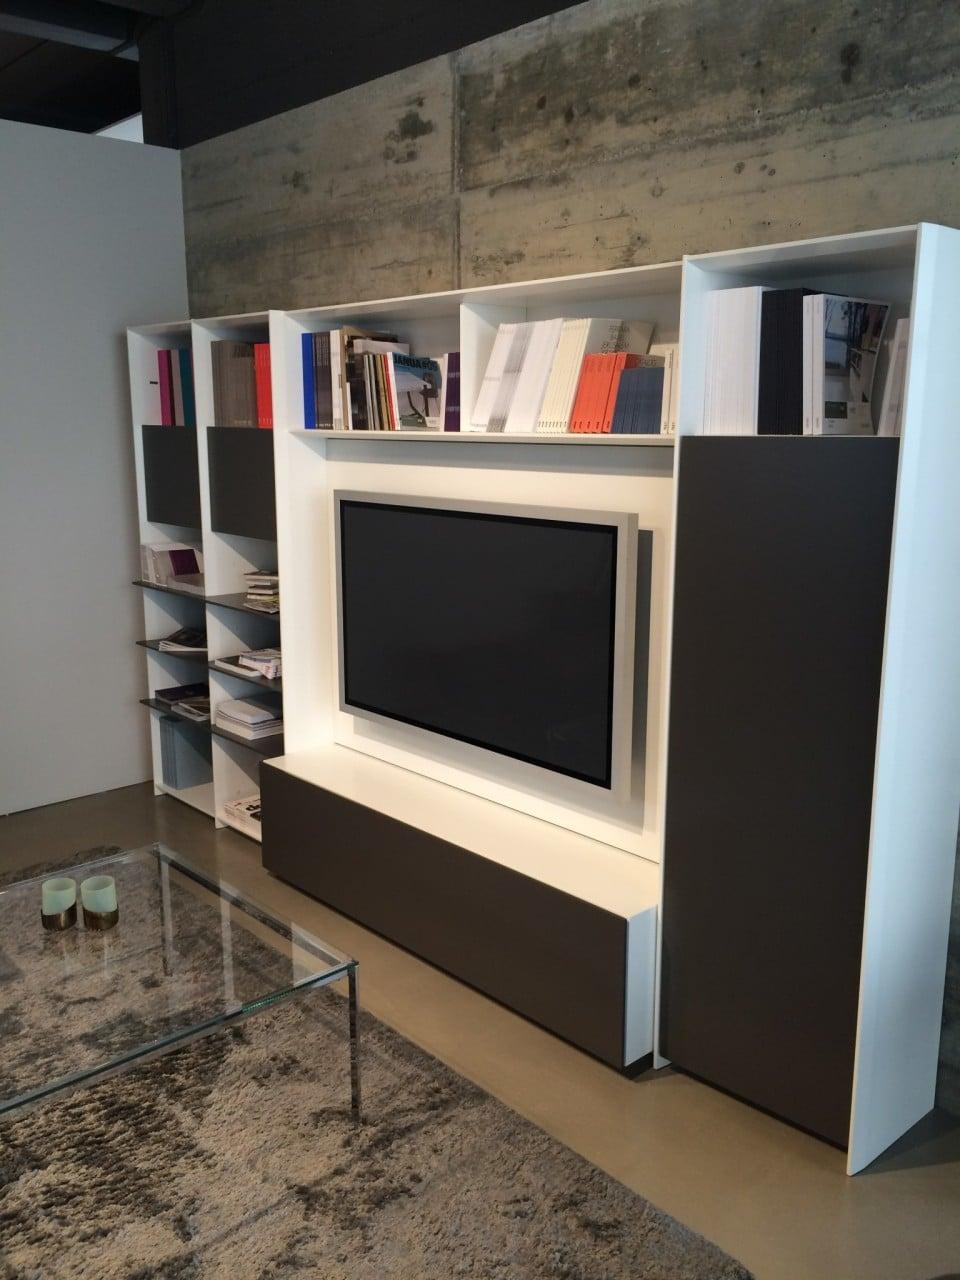 interl bke grid gilbertinteriors. Black Bedroom Furniture Sets. Home Design Ideas